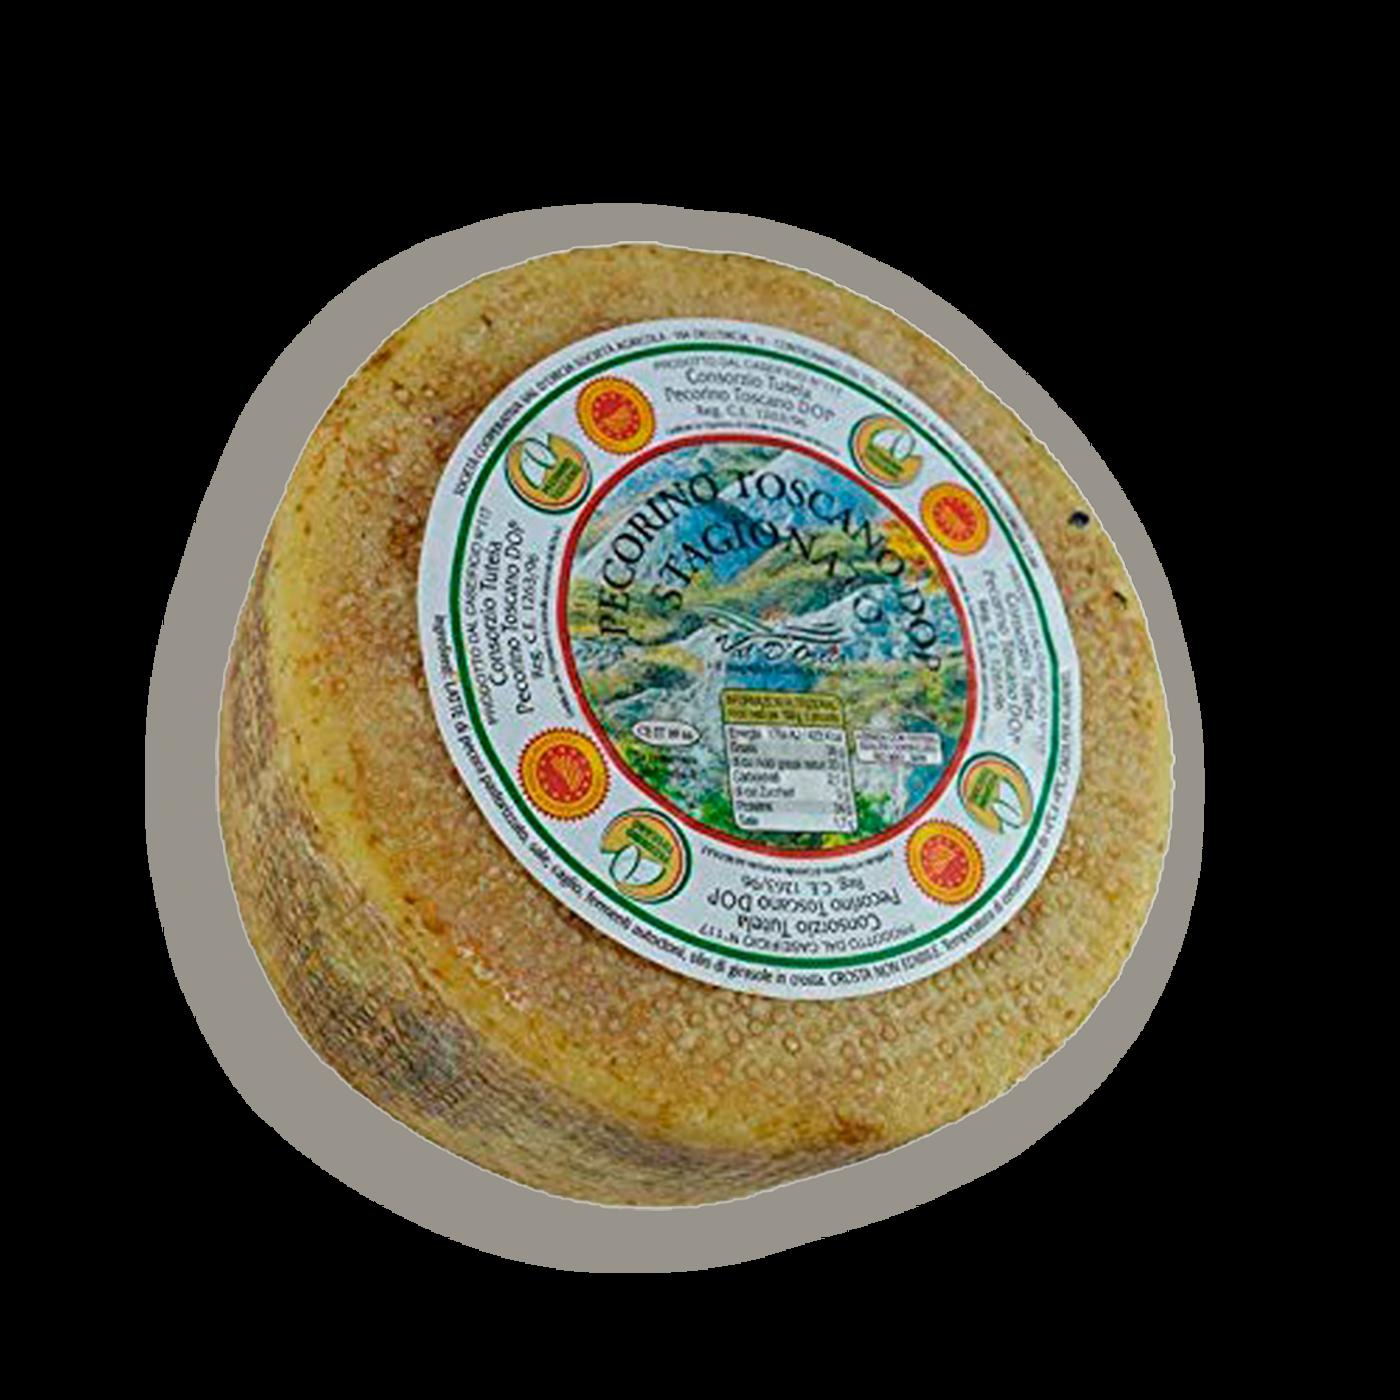 Pecorino Toscano Dop Stagionato